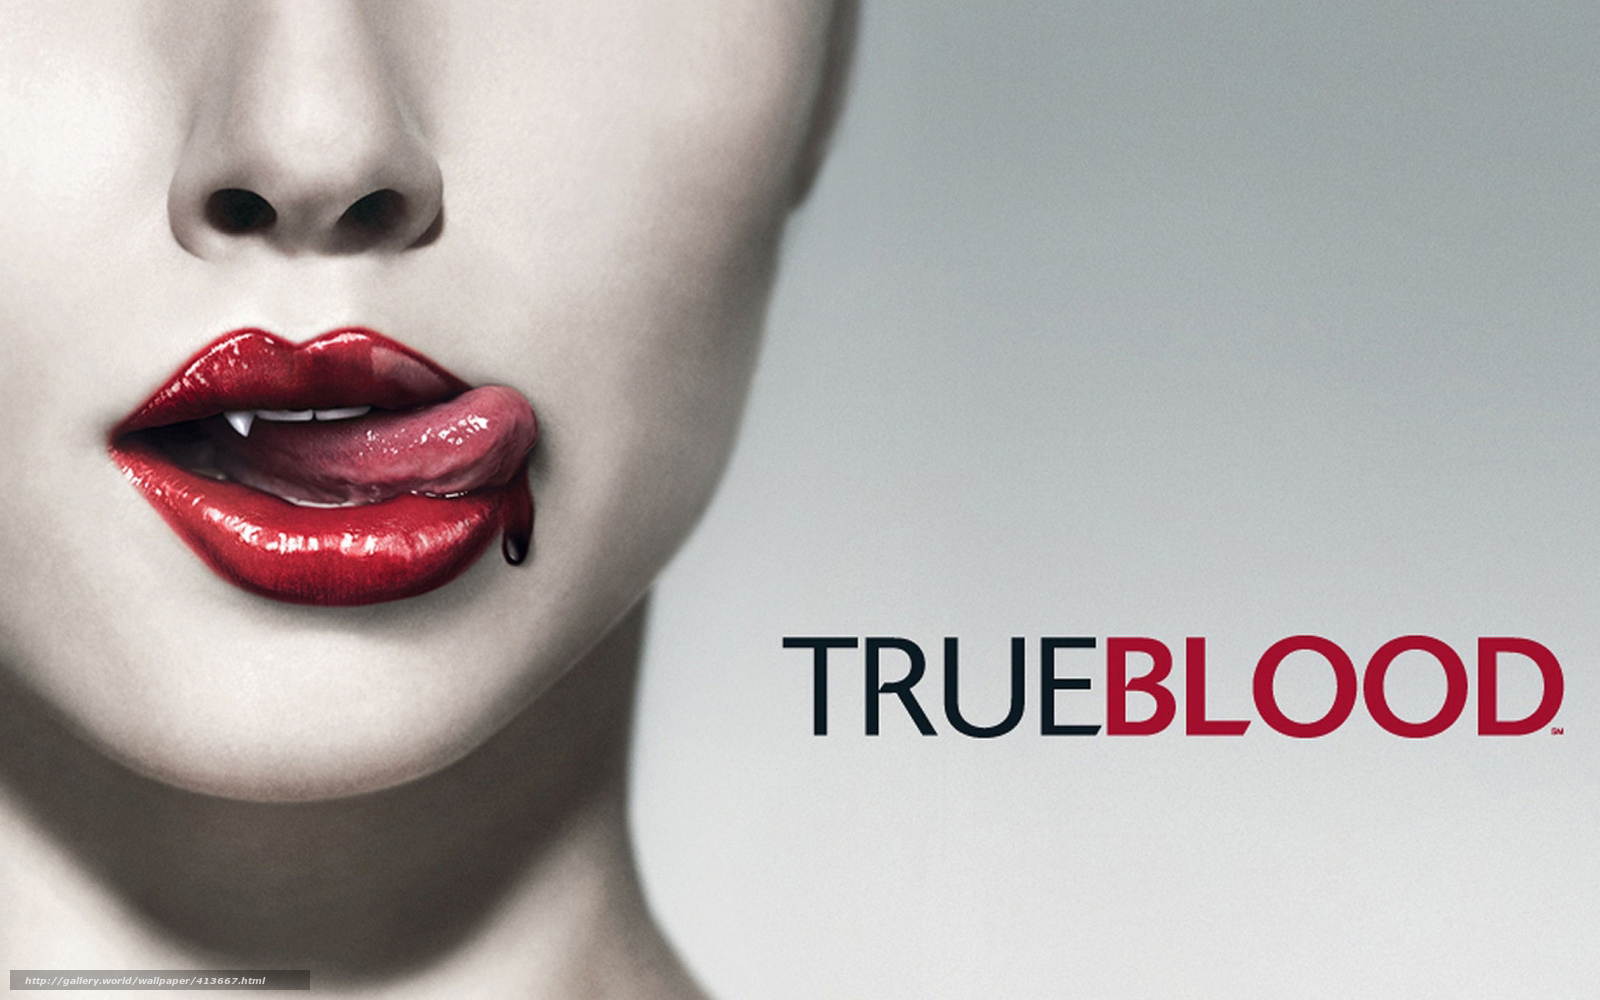 Download wallpaper True Blood,  Vampires,  blood free desktop wallpaper in the resolution 1680x1050 — picture №413667